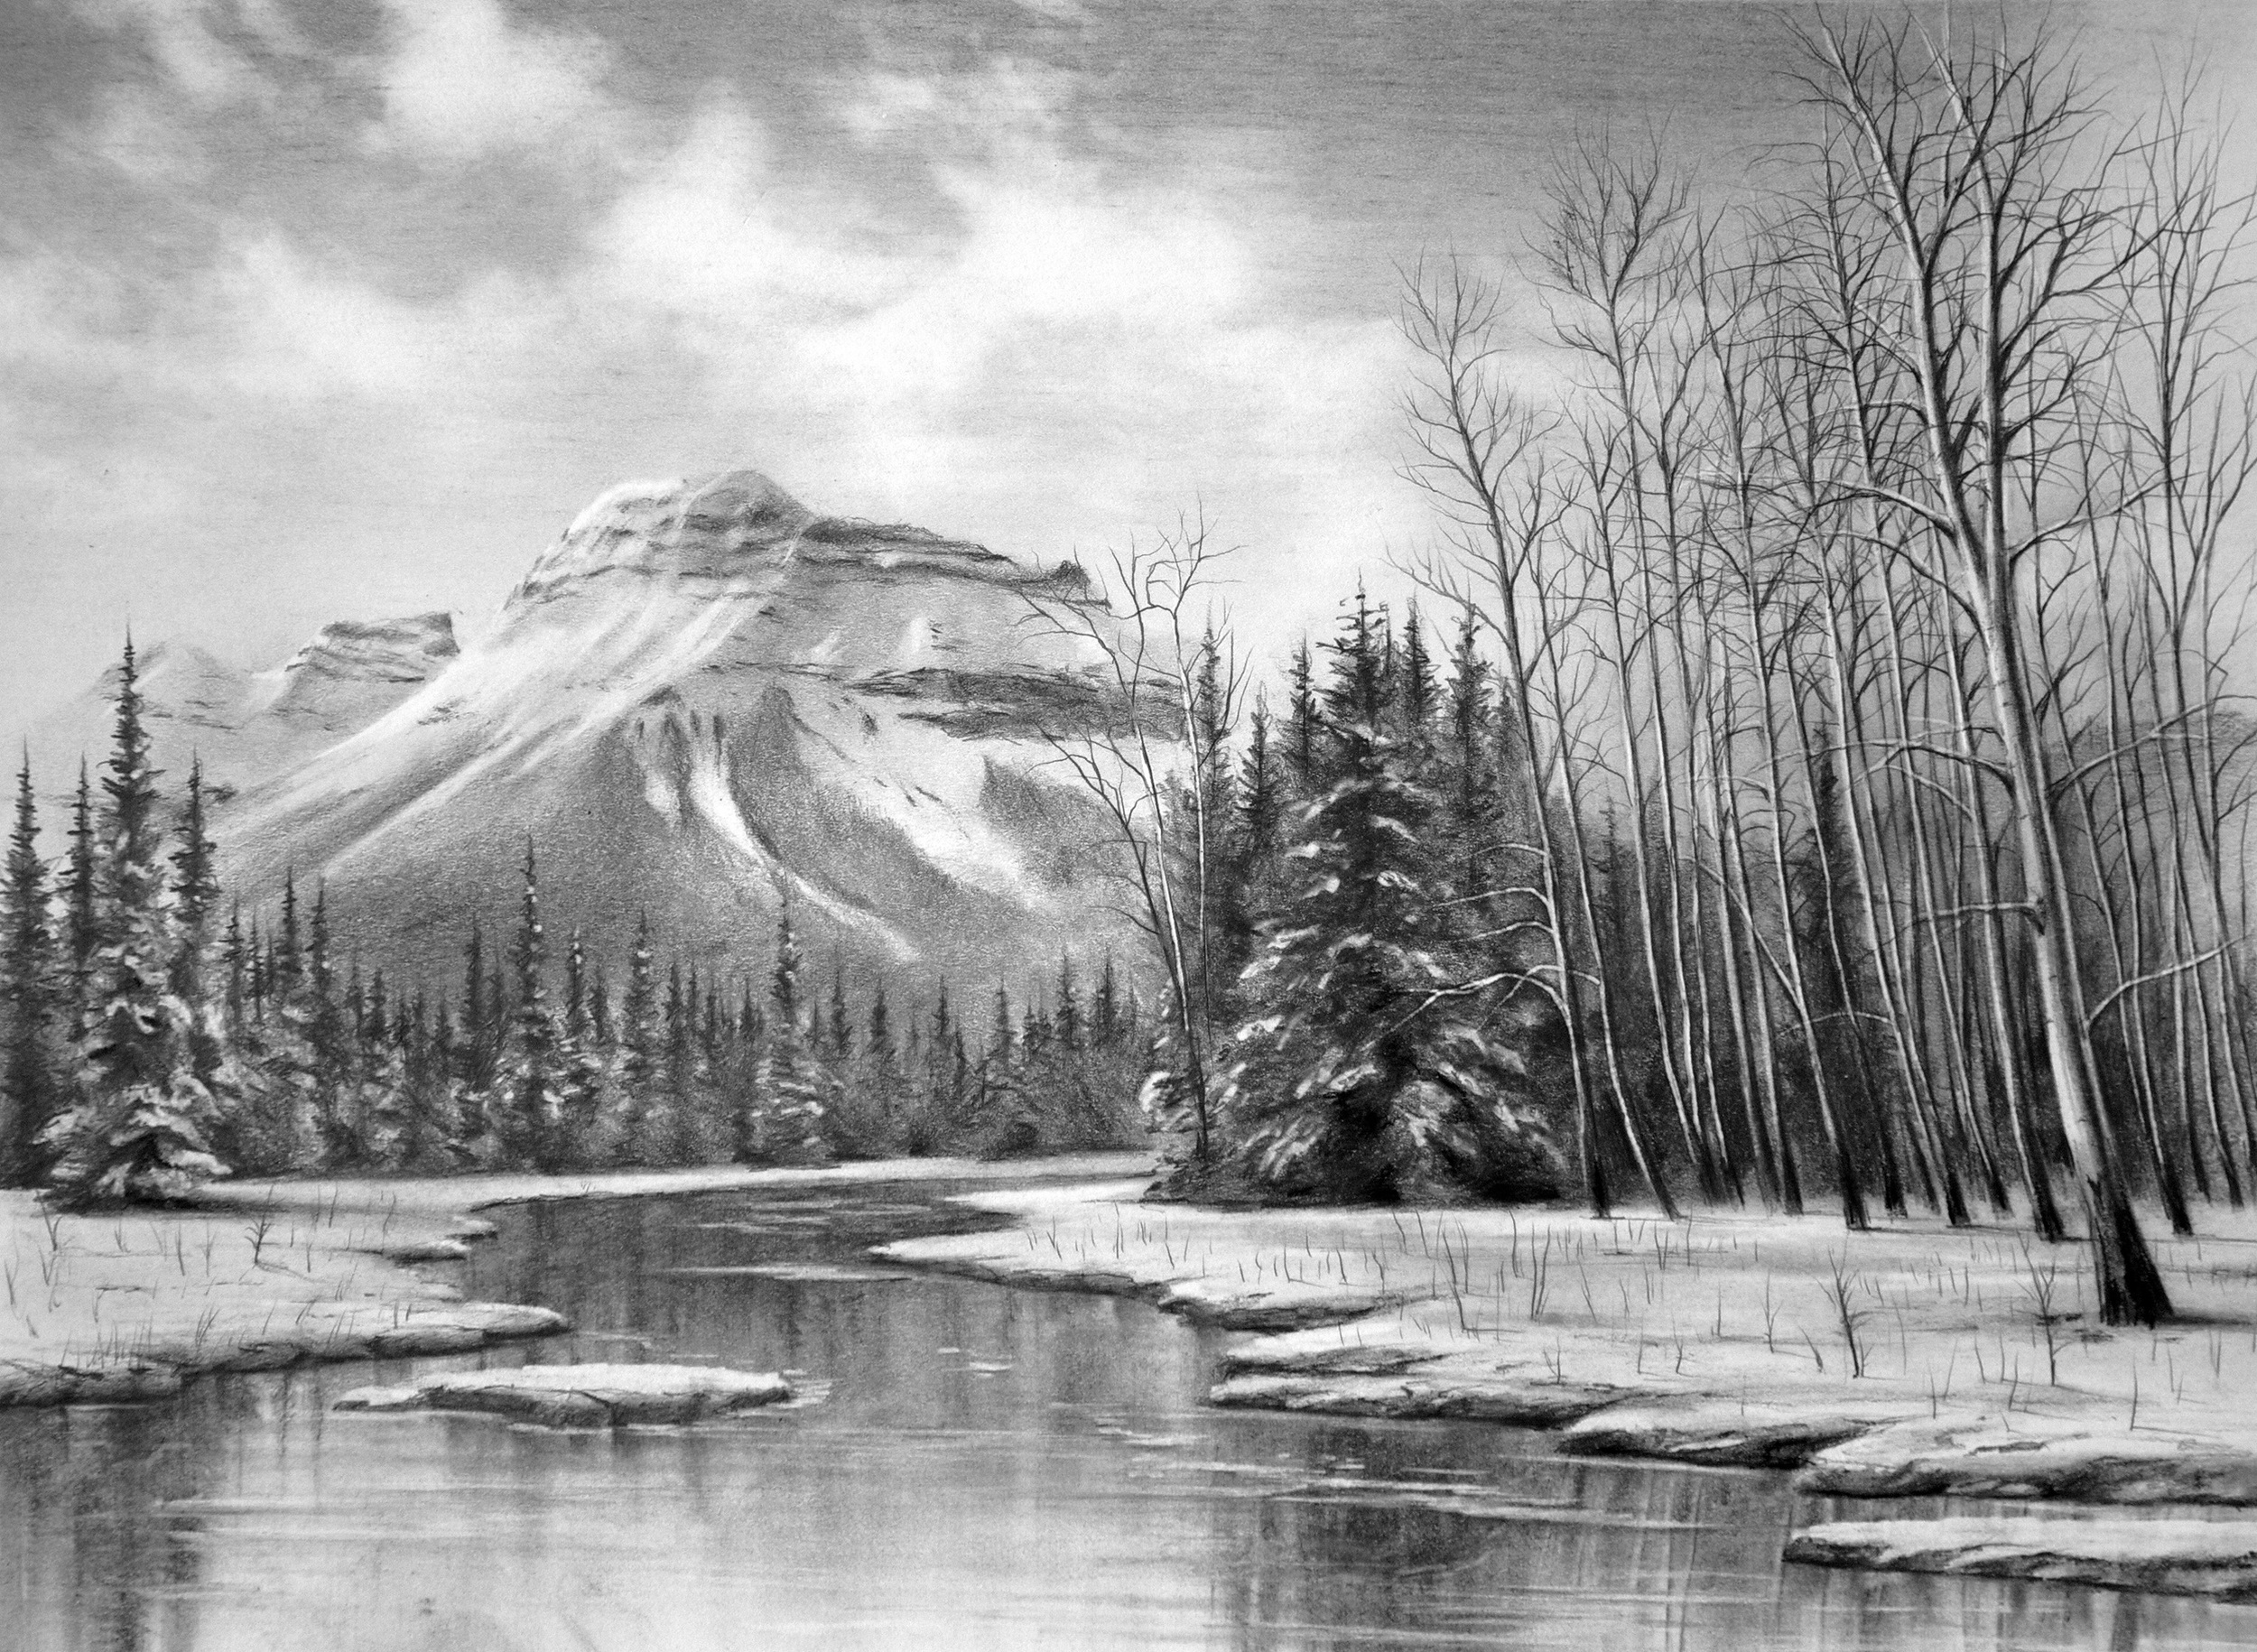 Albert A-bill-higginson-artist-graphite-drawing-realism-black-and-white